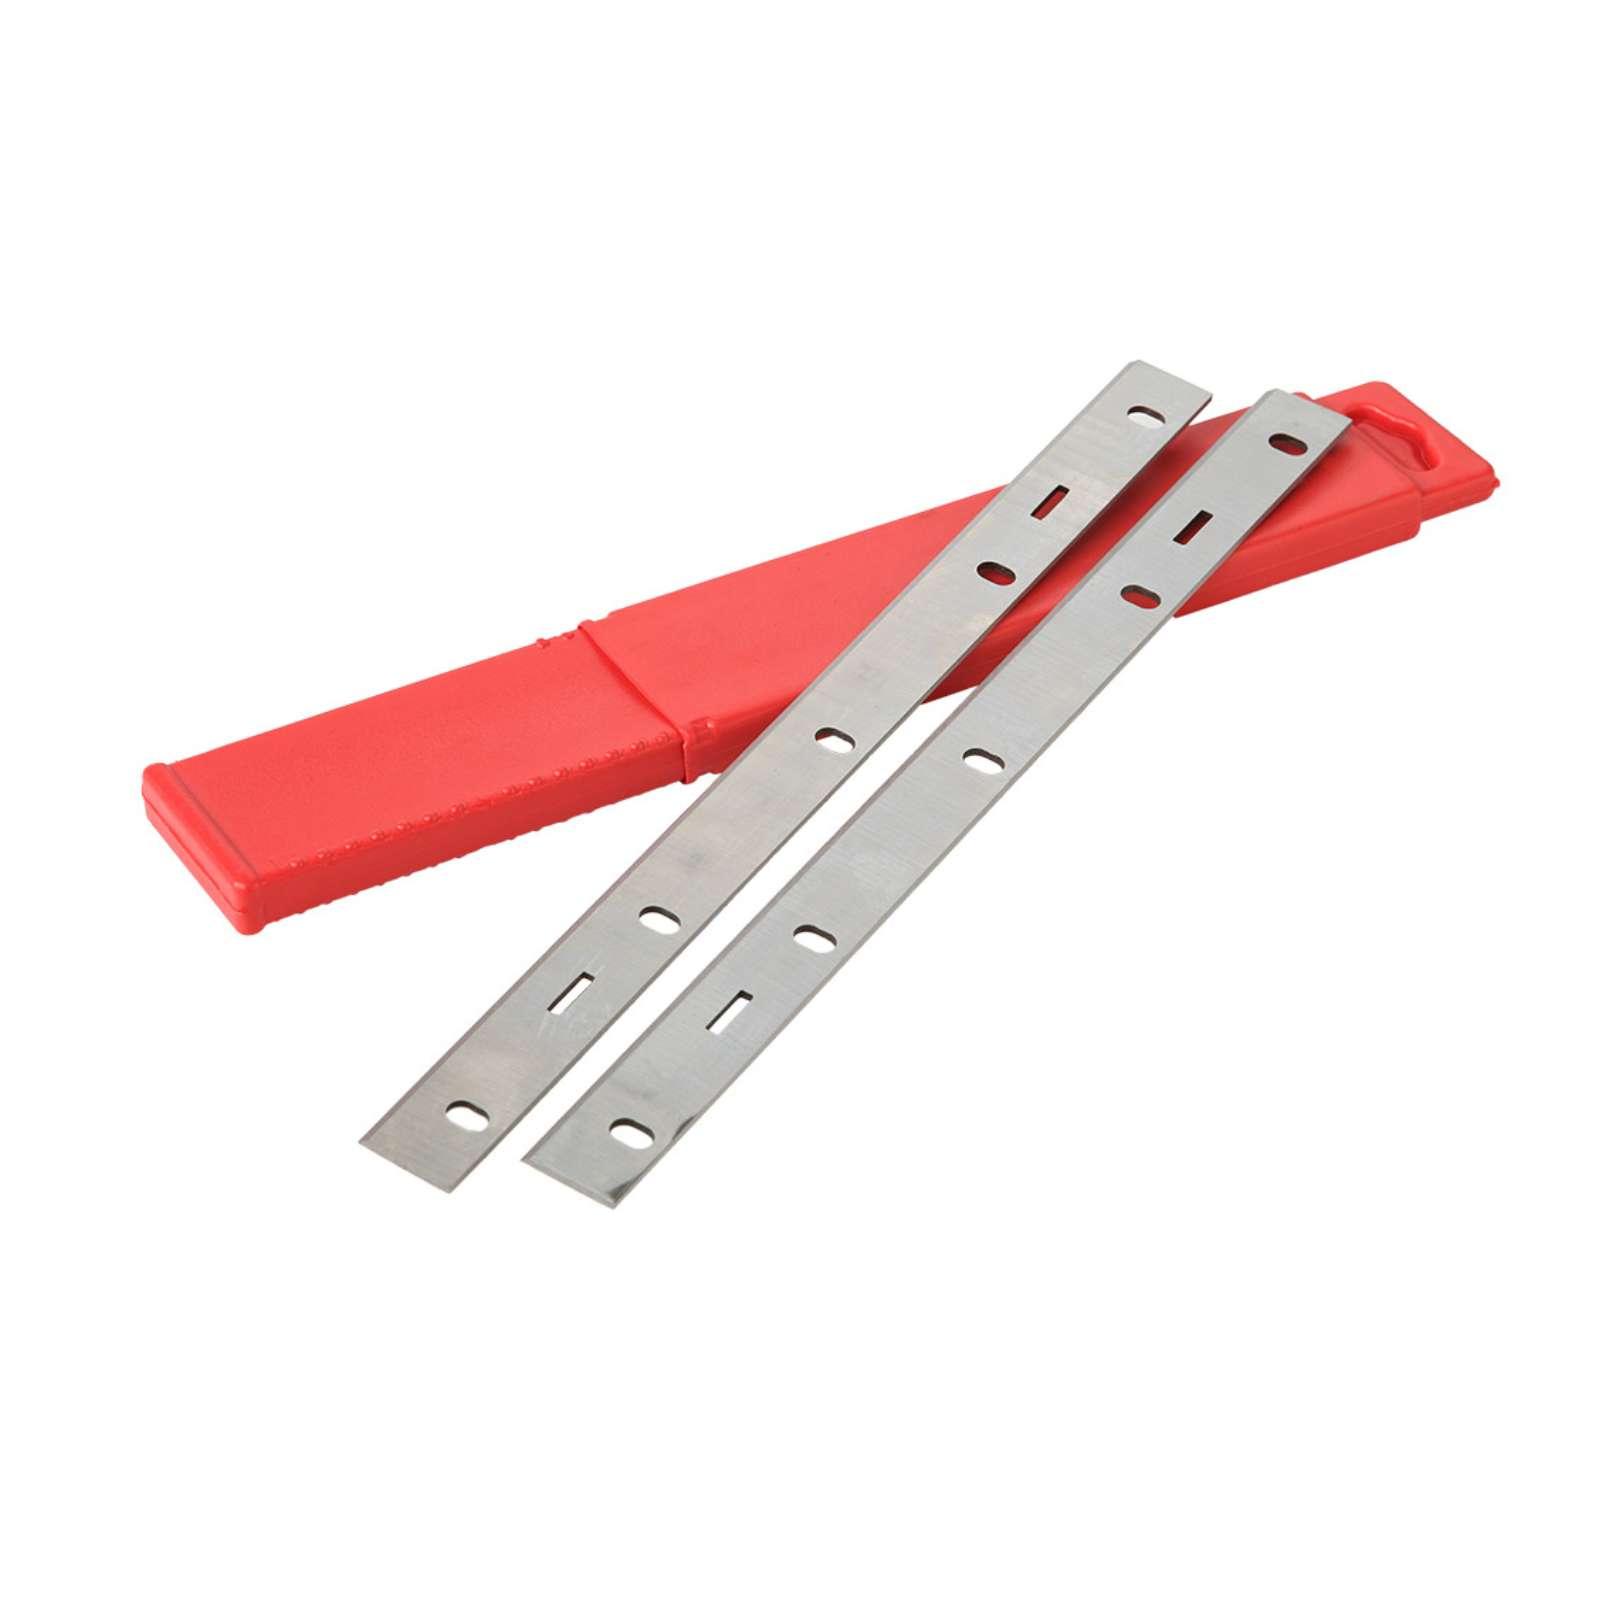 Ножи Belmash HSS 270х2х20 пара (2шт.)